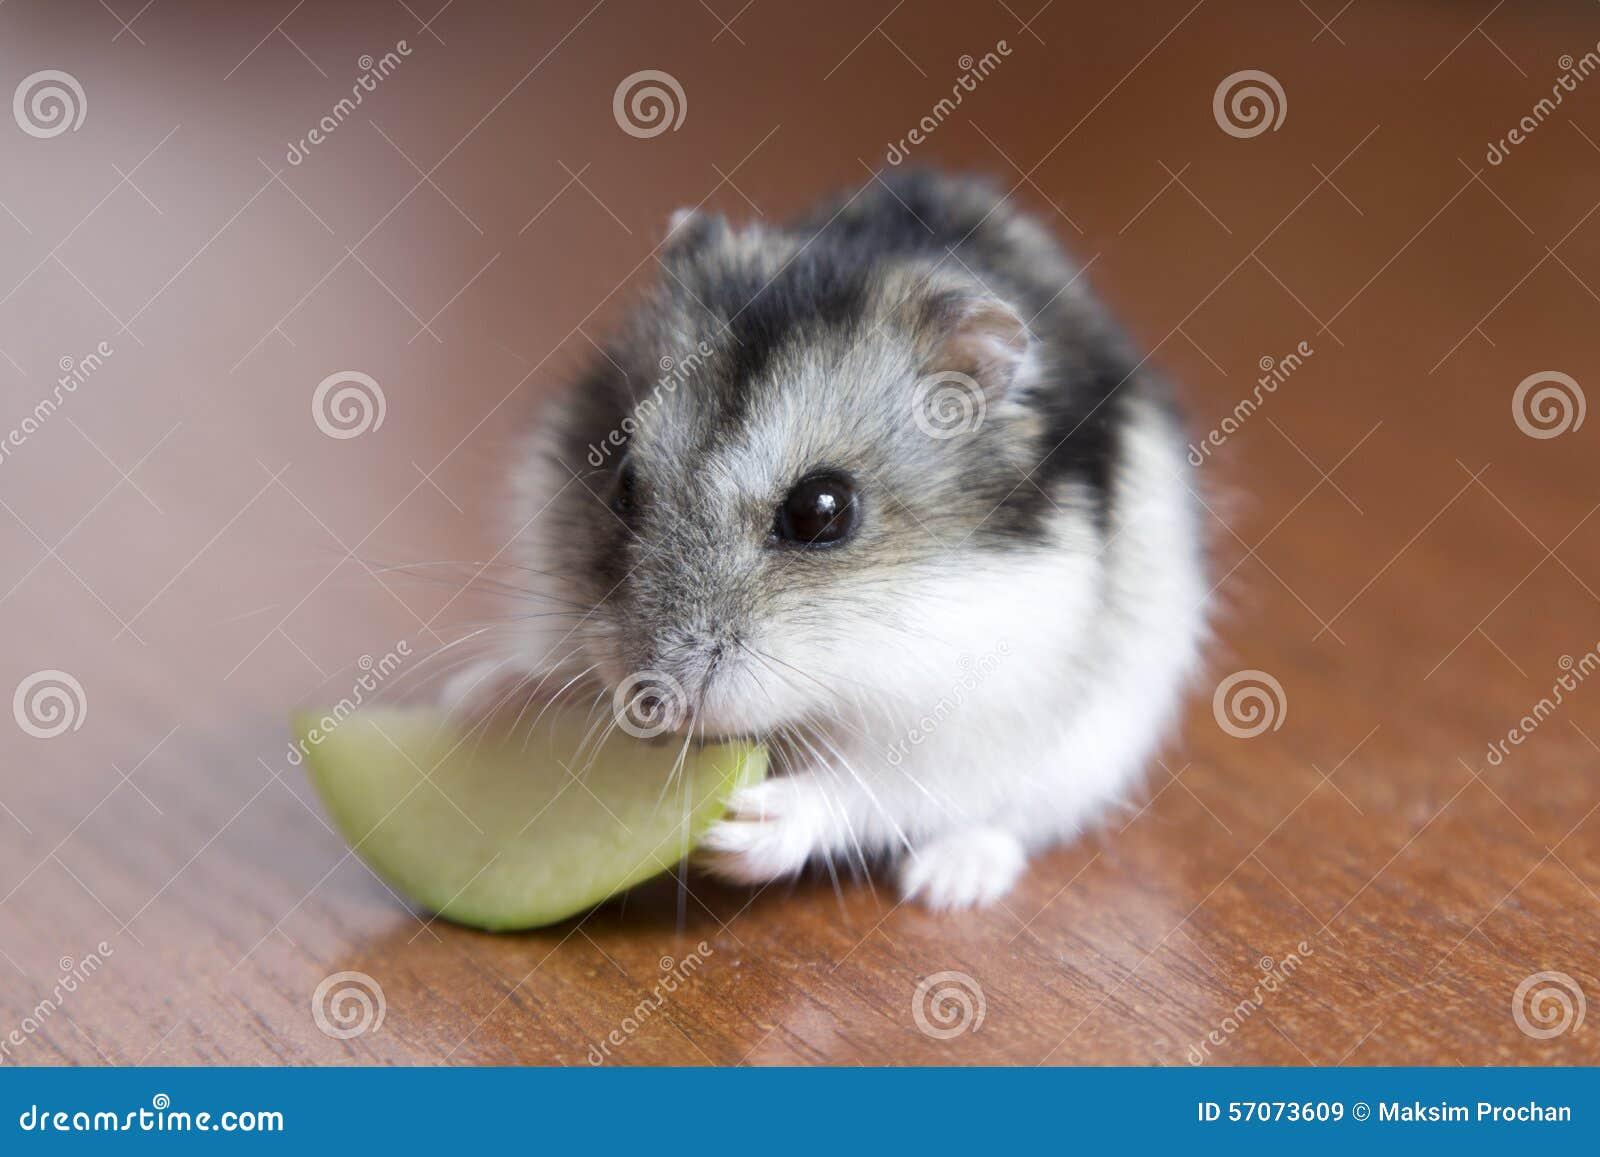 De leuke hamster eet appel